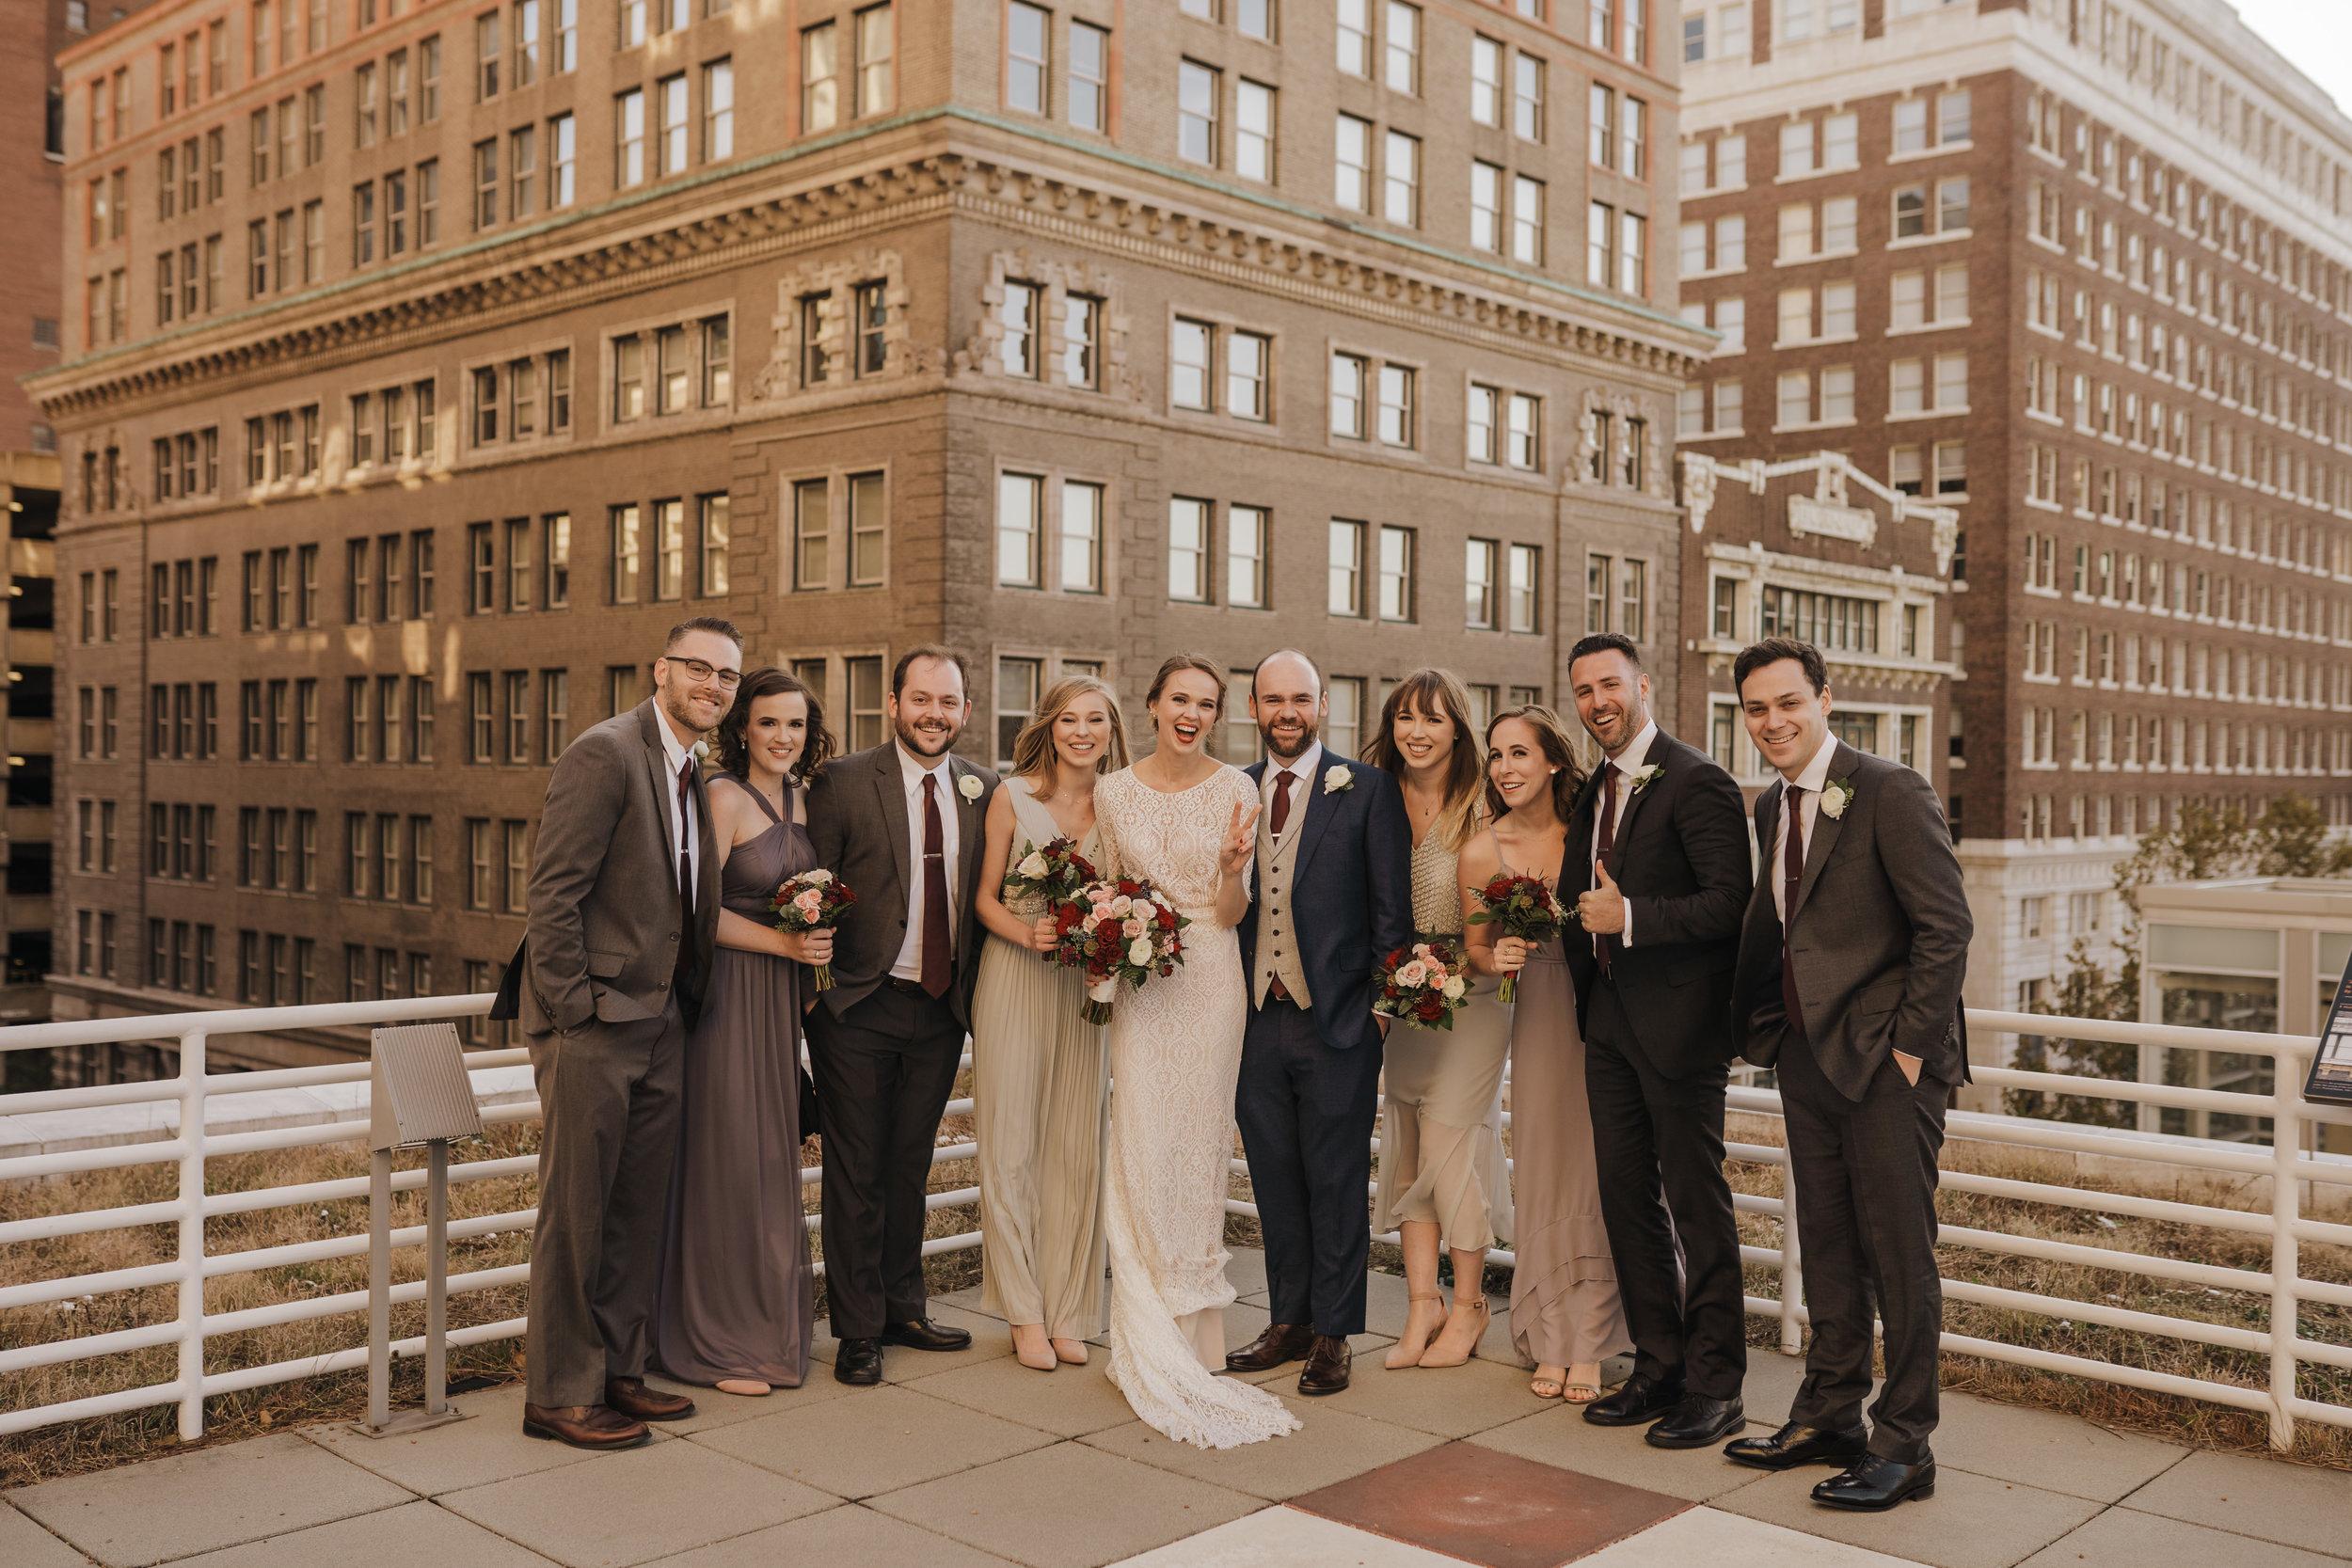 Kansas City Public Library - Kansas City Wedding Venue